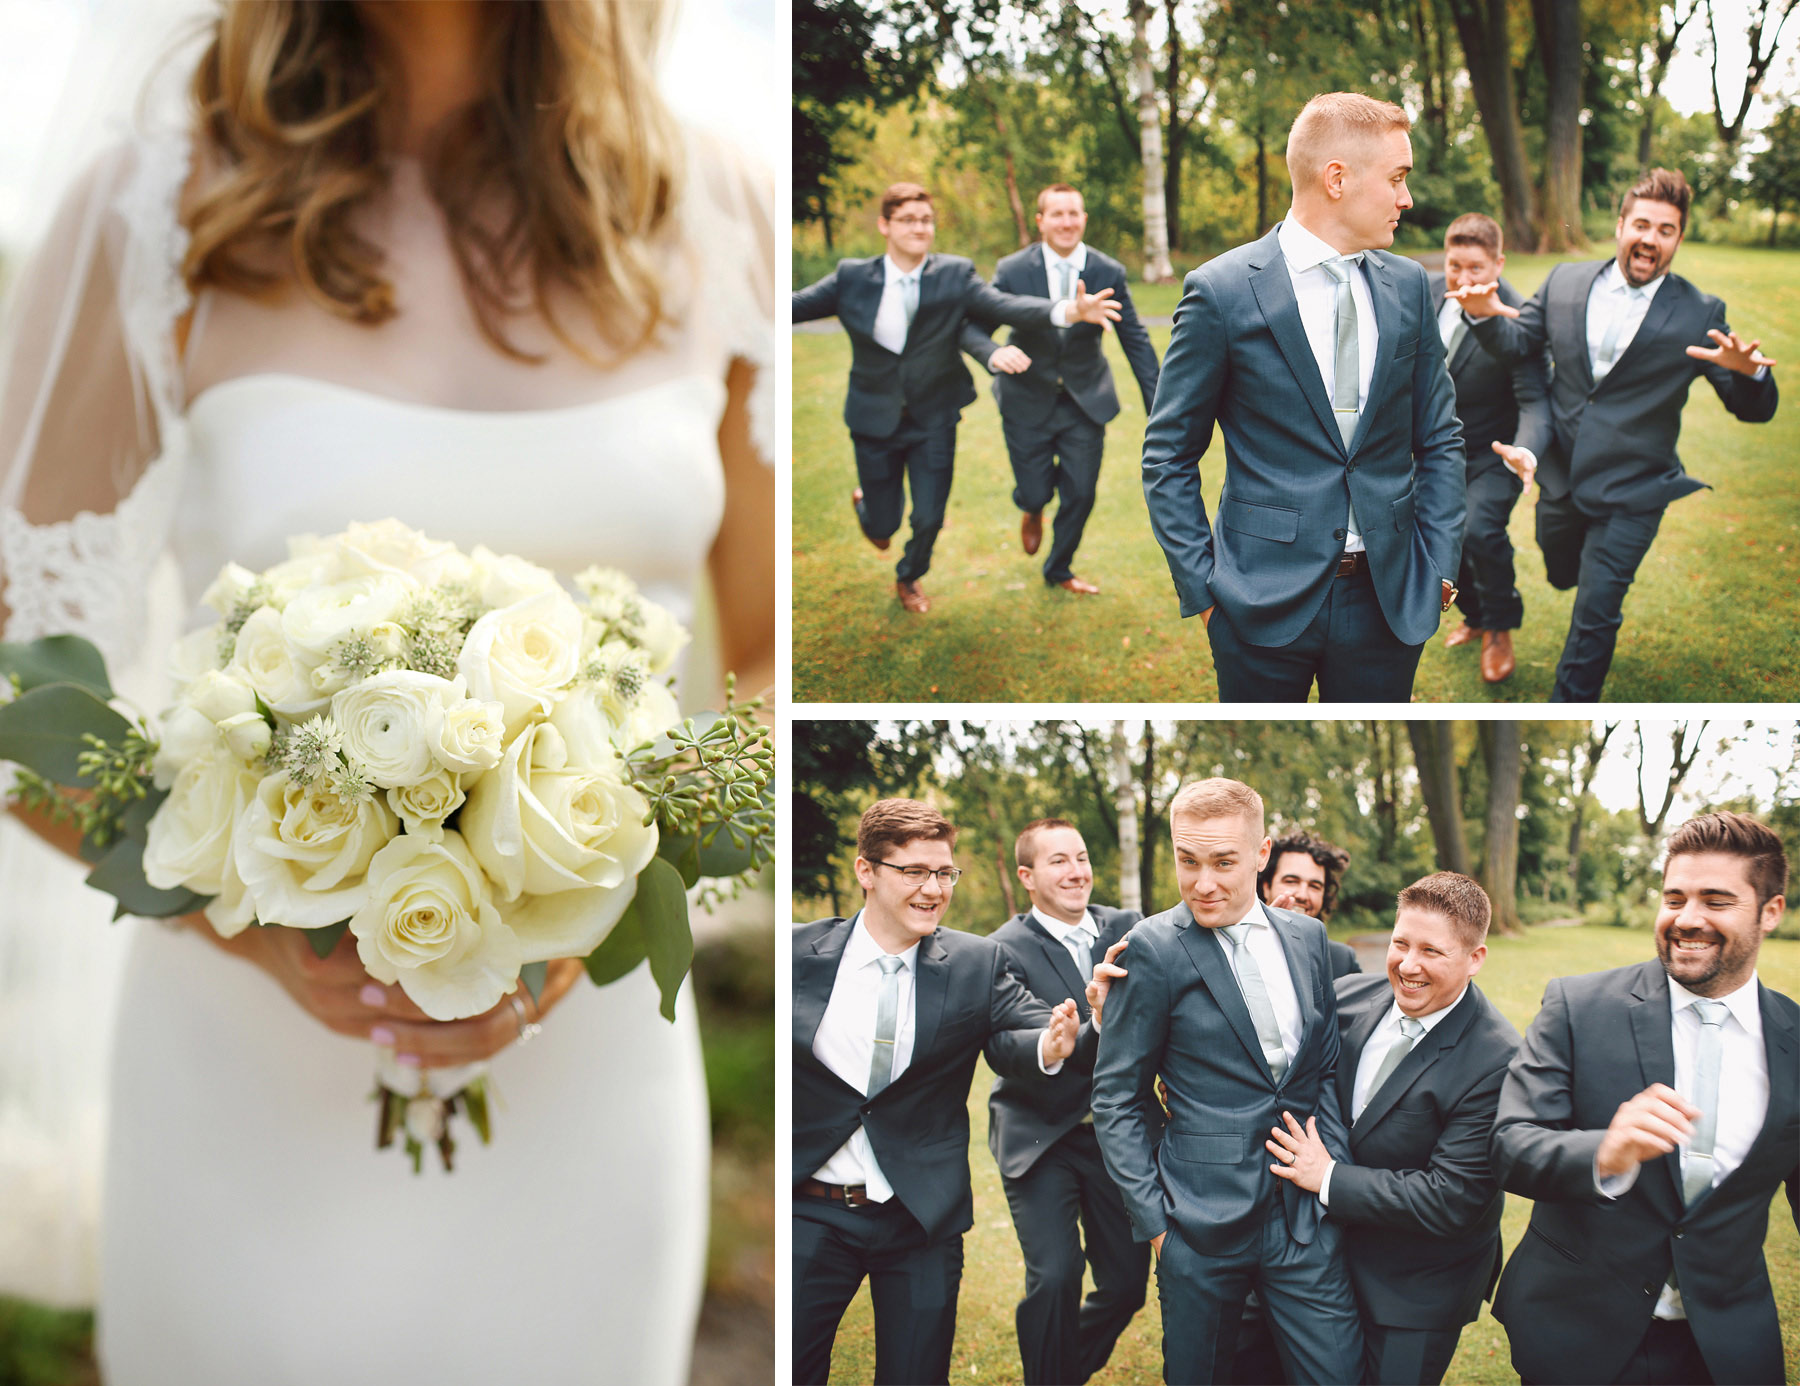 14-Dellwood-Minnesota-Wedding-Photographer-by-Andrew-Vick-Photography-Summer-Country-Club-Bride-Groom-Flowers-Groomsmen-Running-Vintage-Sarah-and-Landon.jpg